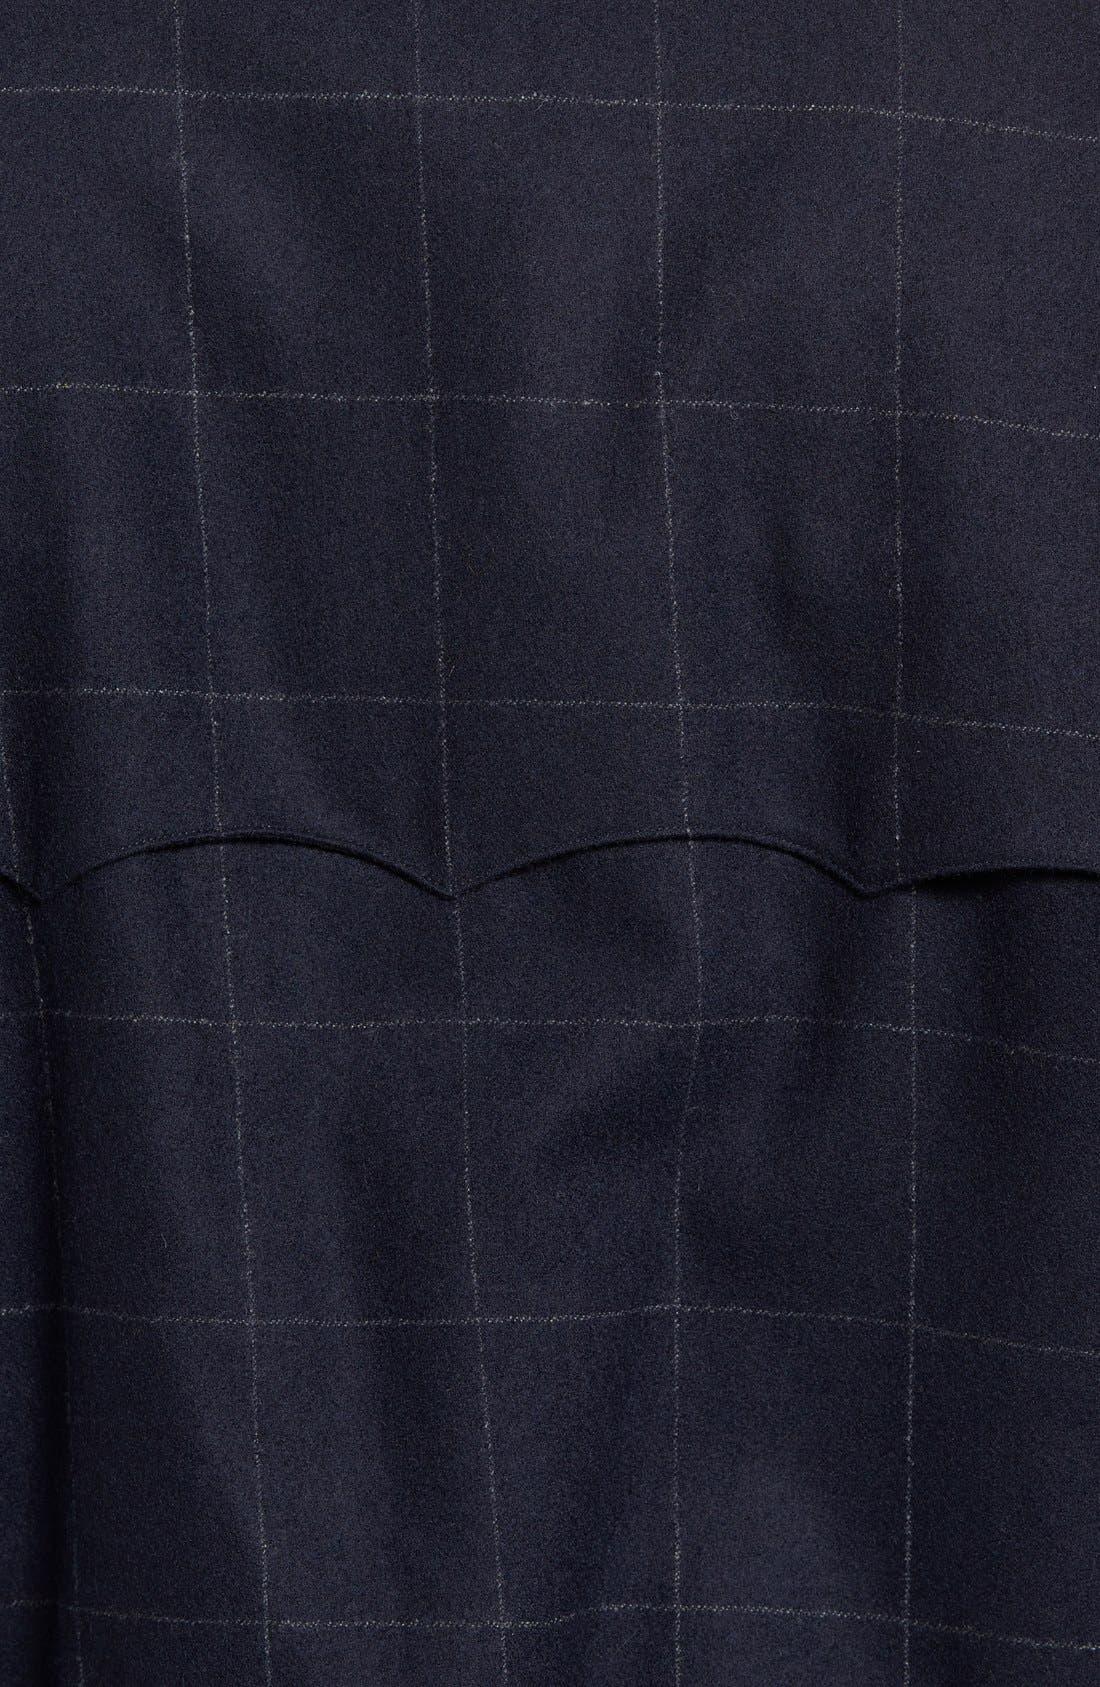 Wool G9 Harrington Jacket,                             Alternate thumbnail 3, color,                             462